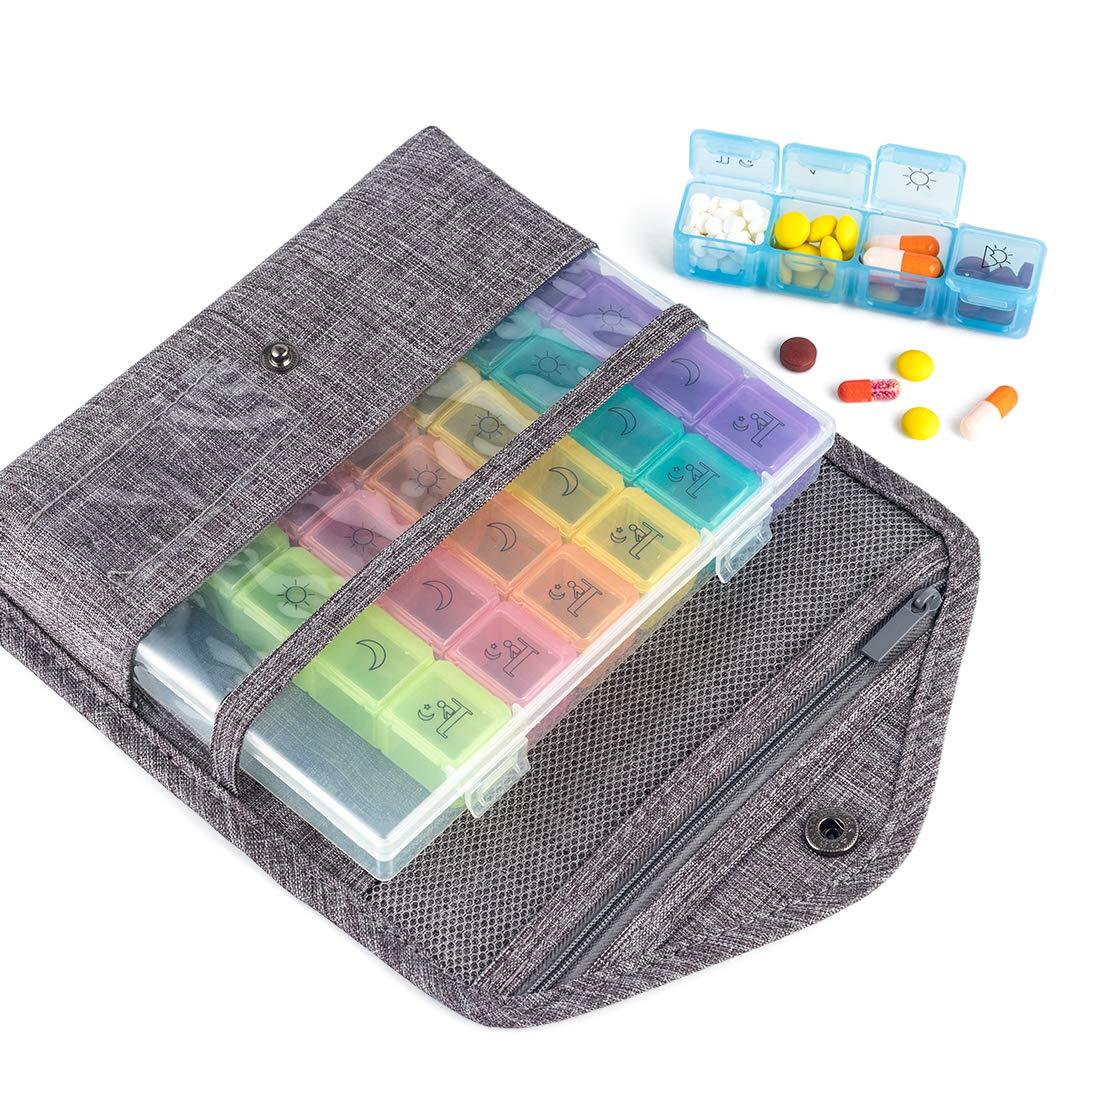 Travel Premium Pill Organizer Case Box Passport Wallet,Multi-Function Daily Pill Box for Vitamin/Fish Oil/Supplements